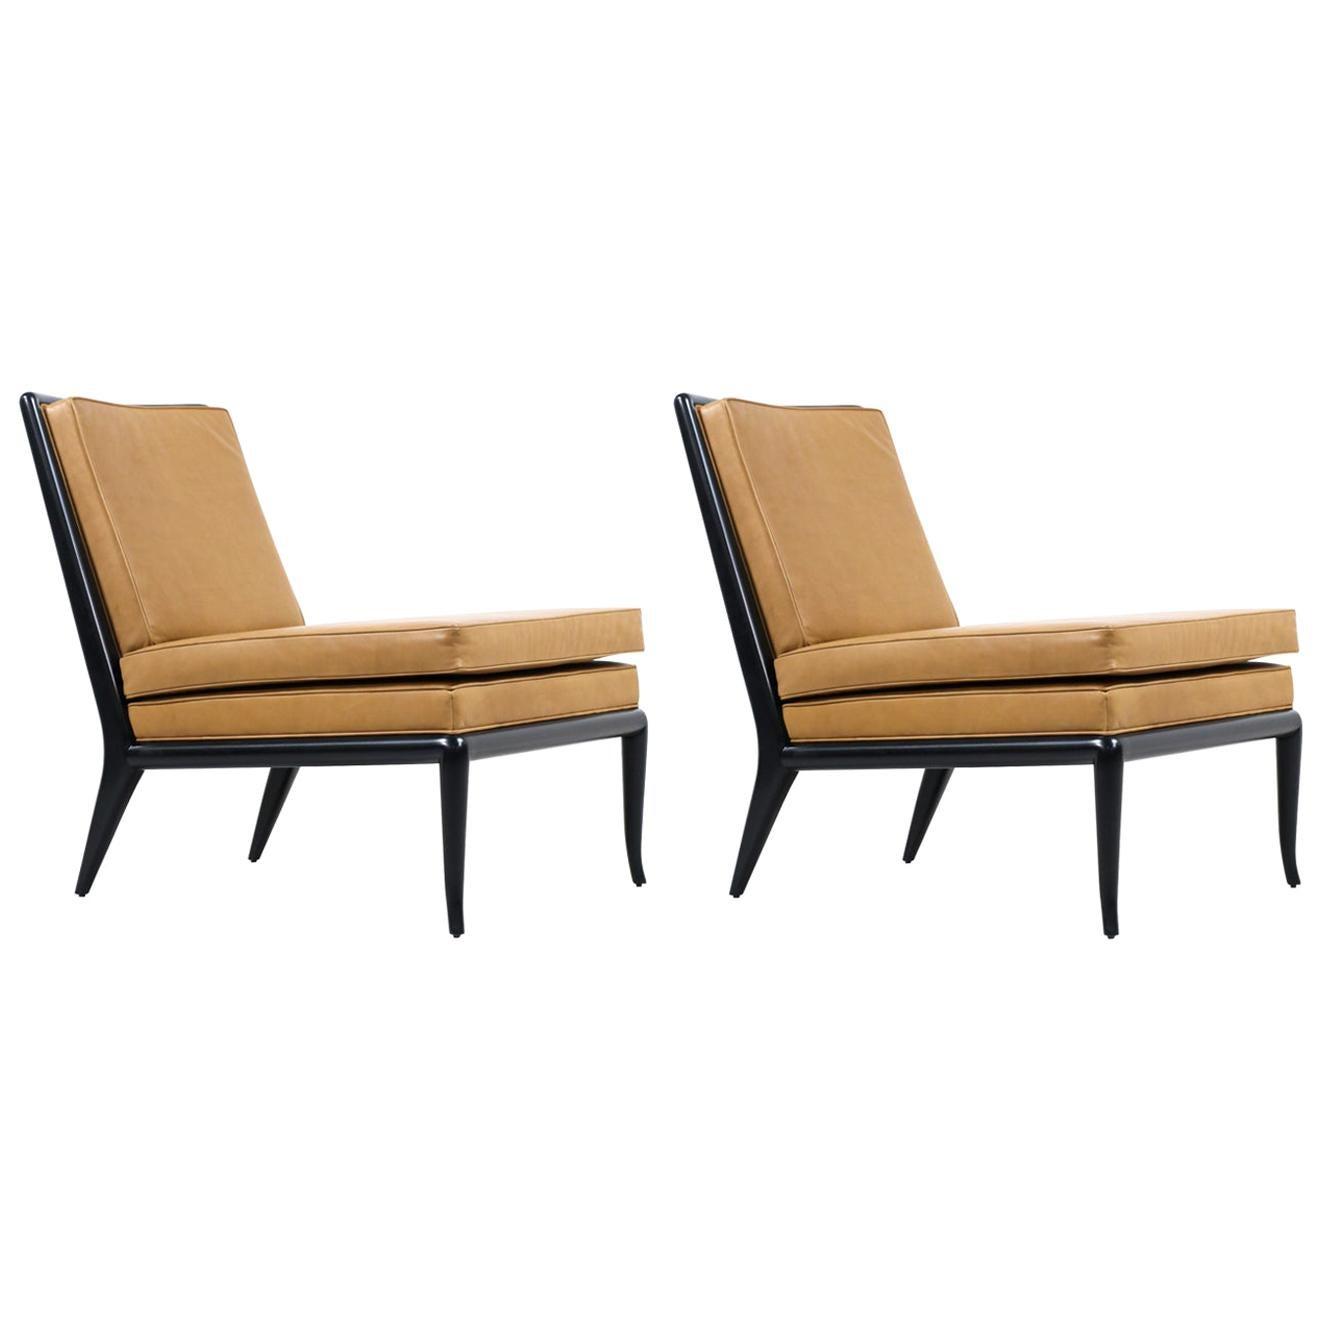 T.H. Robsjohn-Gibbings Leather and Ebonized Wood Slipper Chairs for Widdicomb